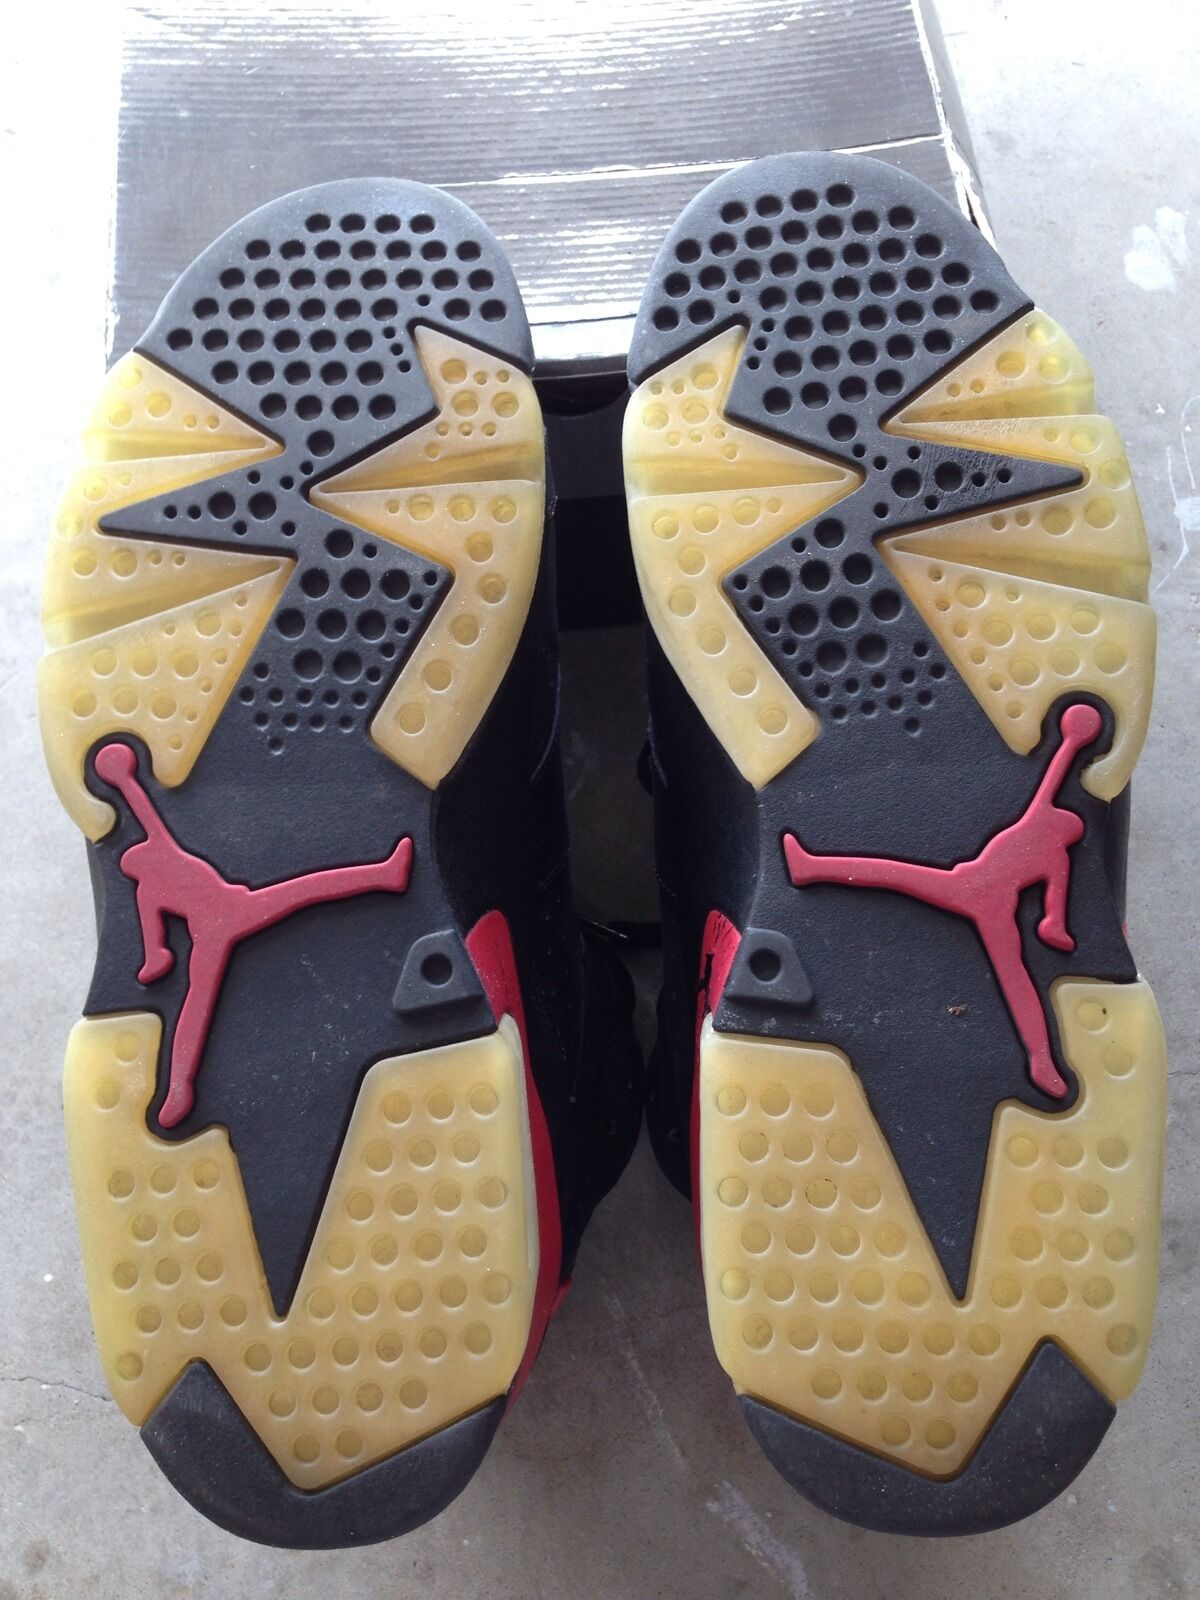 Air Jordan 6 Retro Black/Varsity Red 2018 Size 12